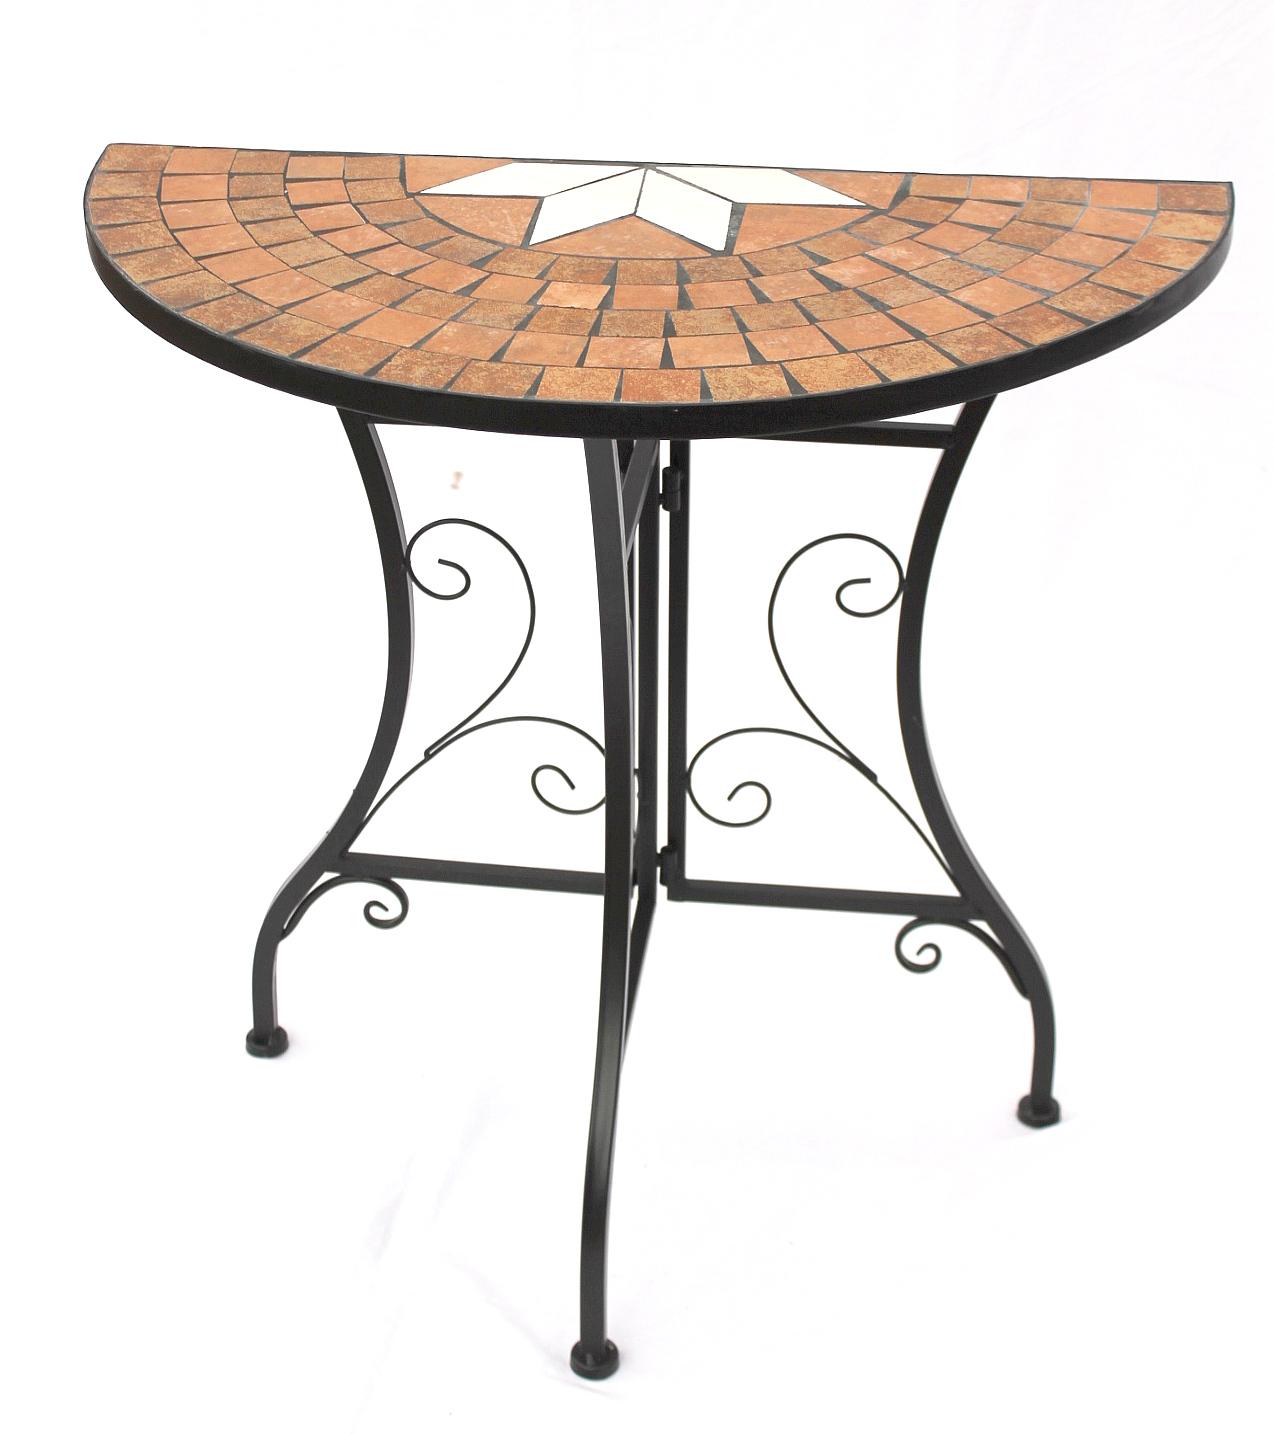 Metall tisch mosaik for Tisch marmoroptik